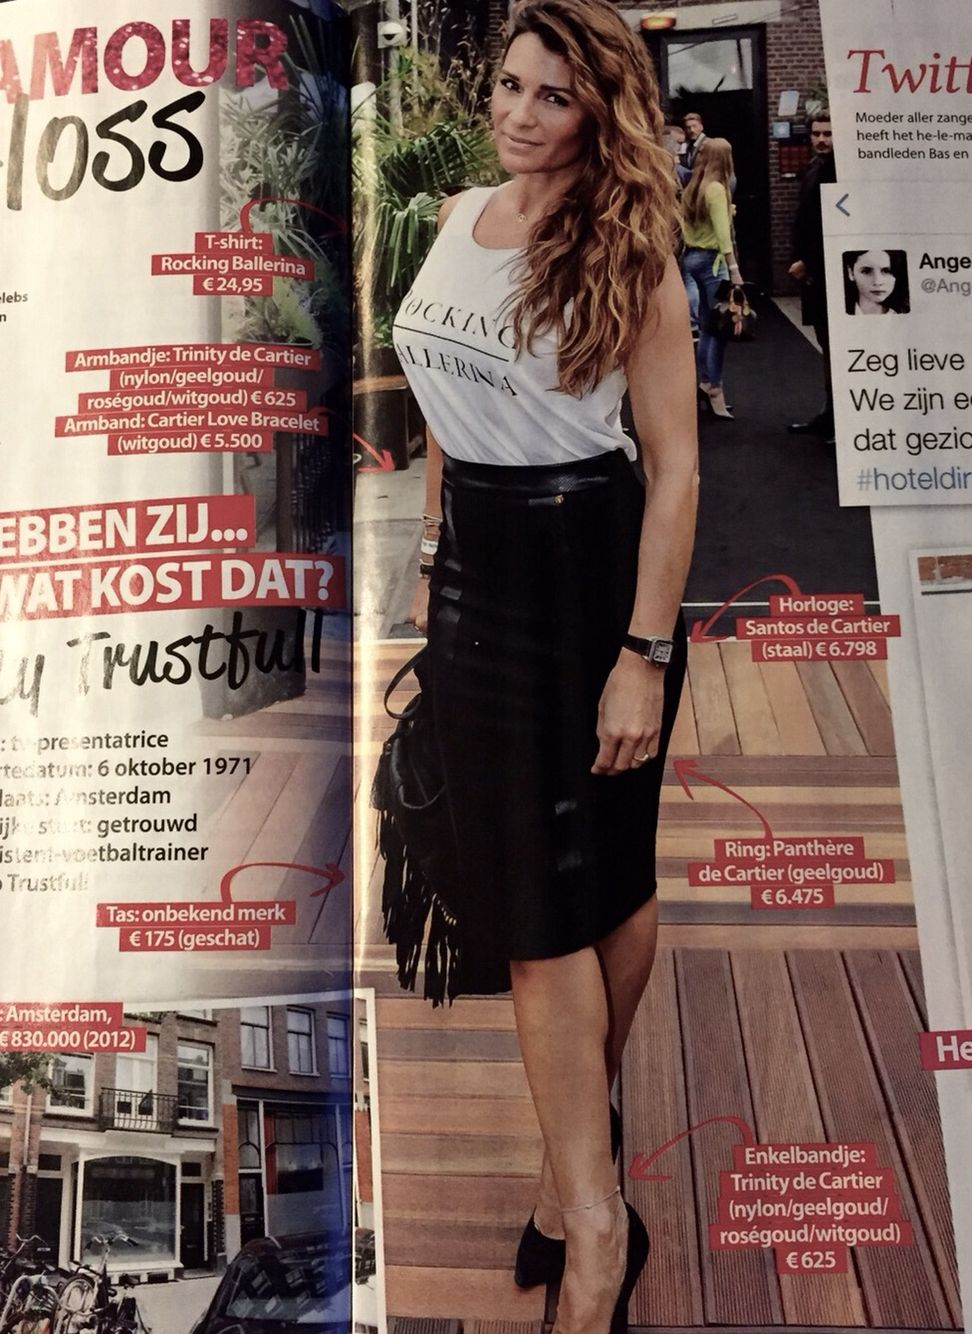 Quinty Trustfull in Gloss Magazine met Rockin'items-Clutchbag http://www.rockinitems.com/Clutchbag-Rockin-Items-fringe-black